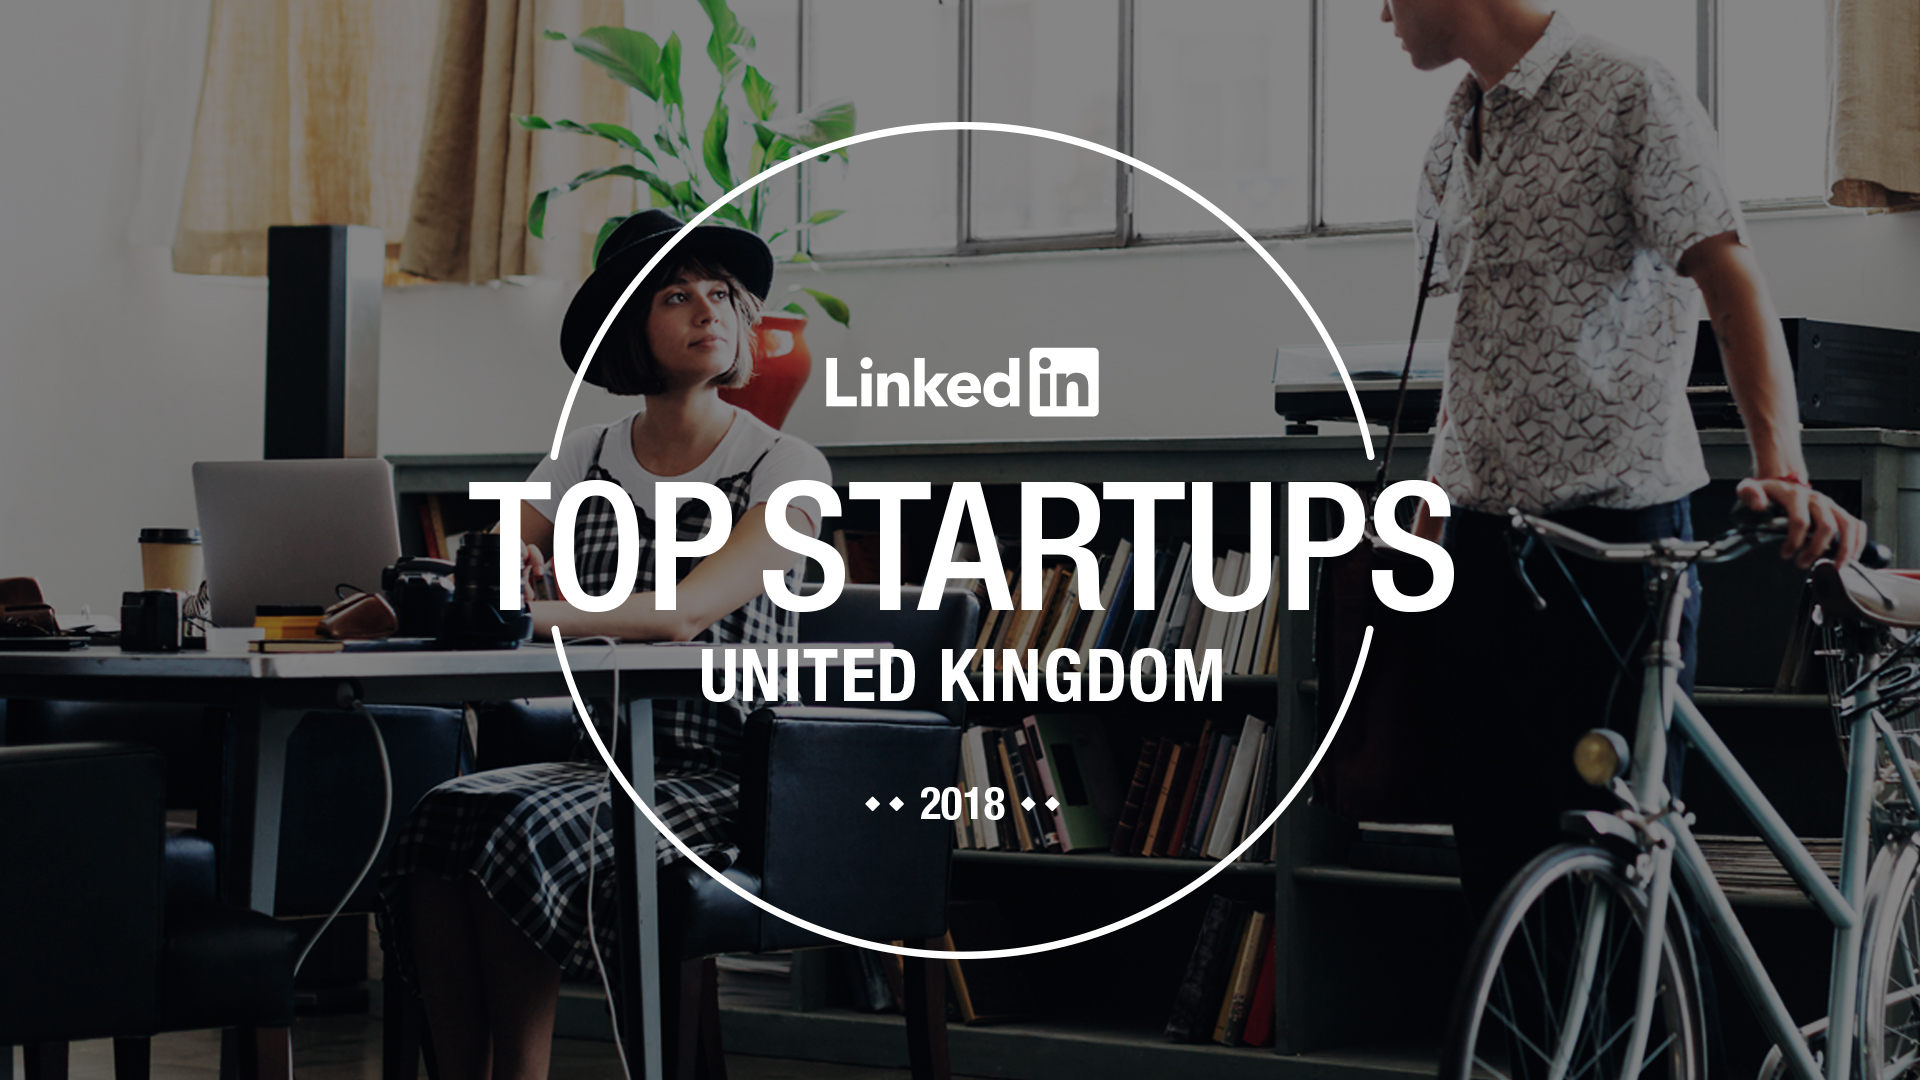 Top-Startups-2018-UK-Twitter_1920x1080 (1).jpg